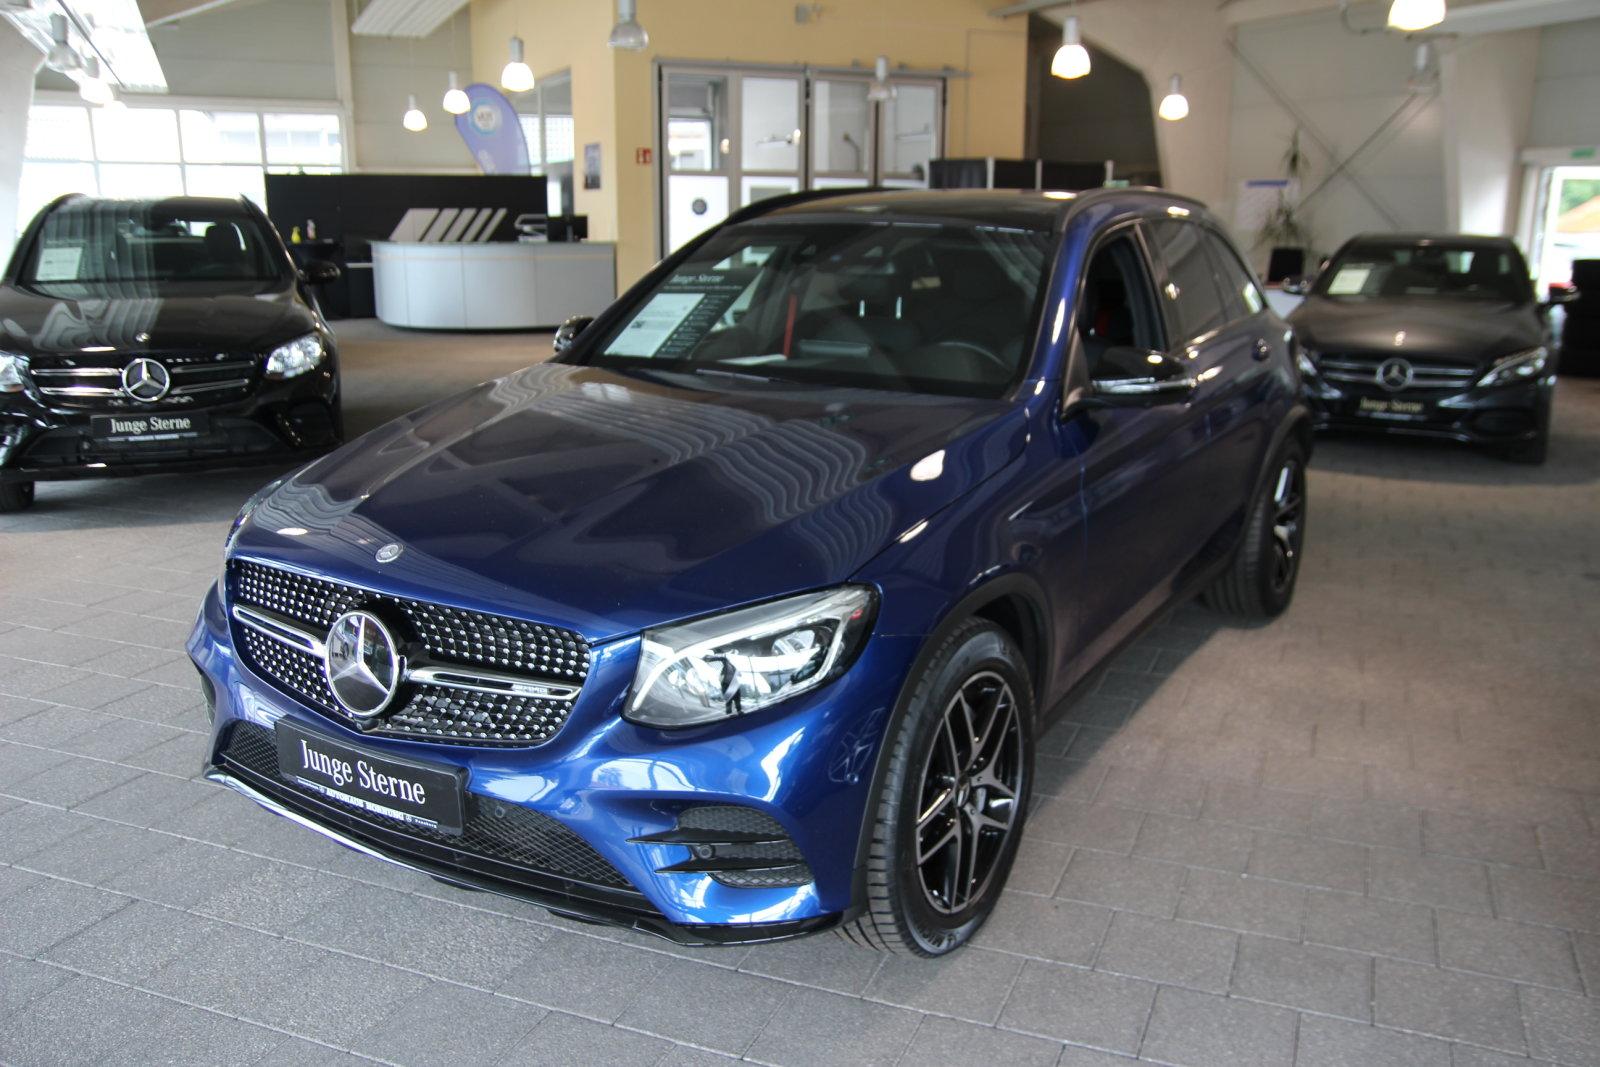 Mercedes-Benz GLC 43 4M/AHK/Distr/Pano/Memory/Comand/Sound LED, Jahr 2017, Benzin